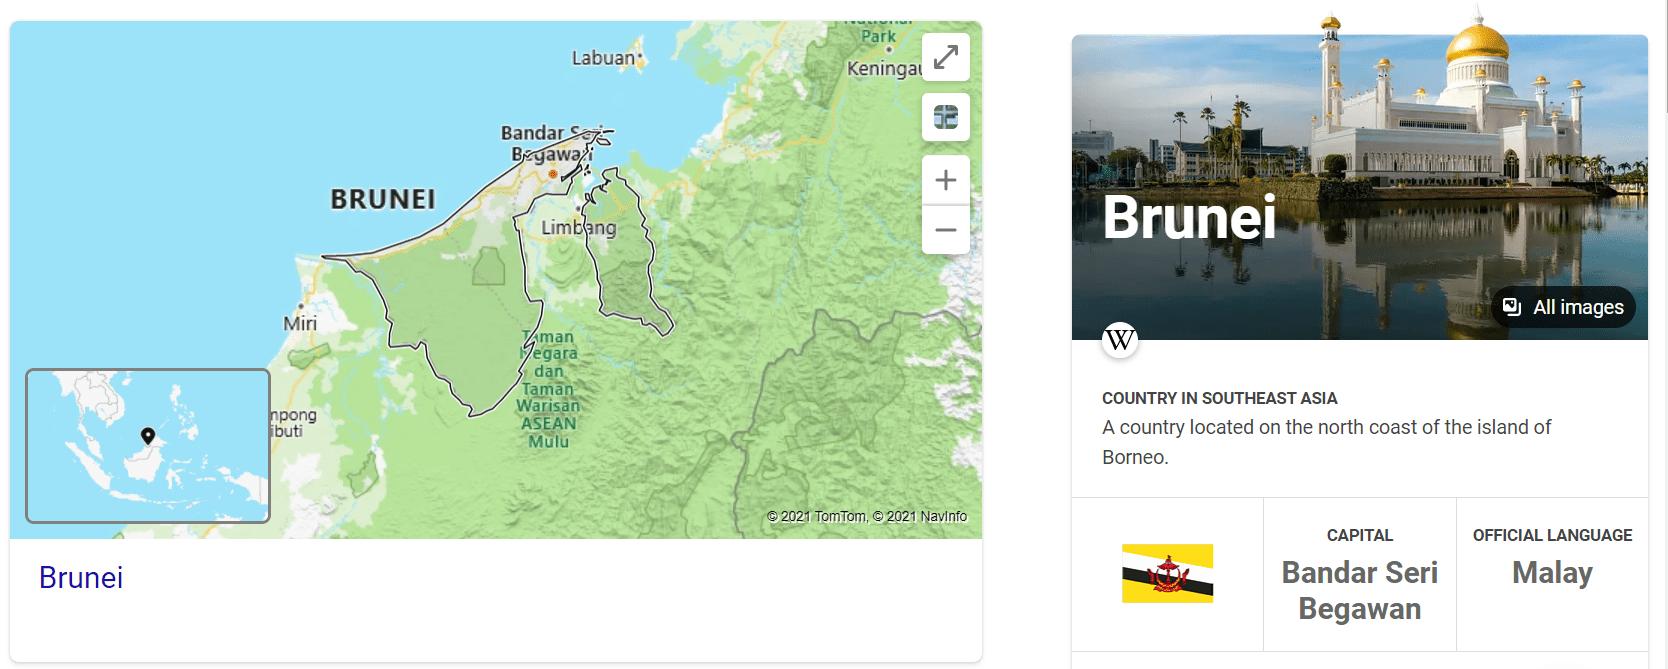 Brunei Private Investigations